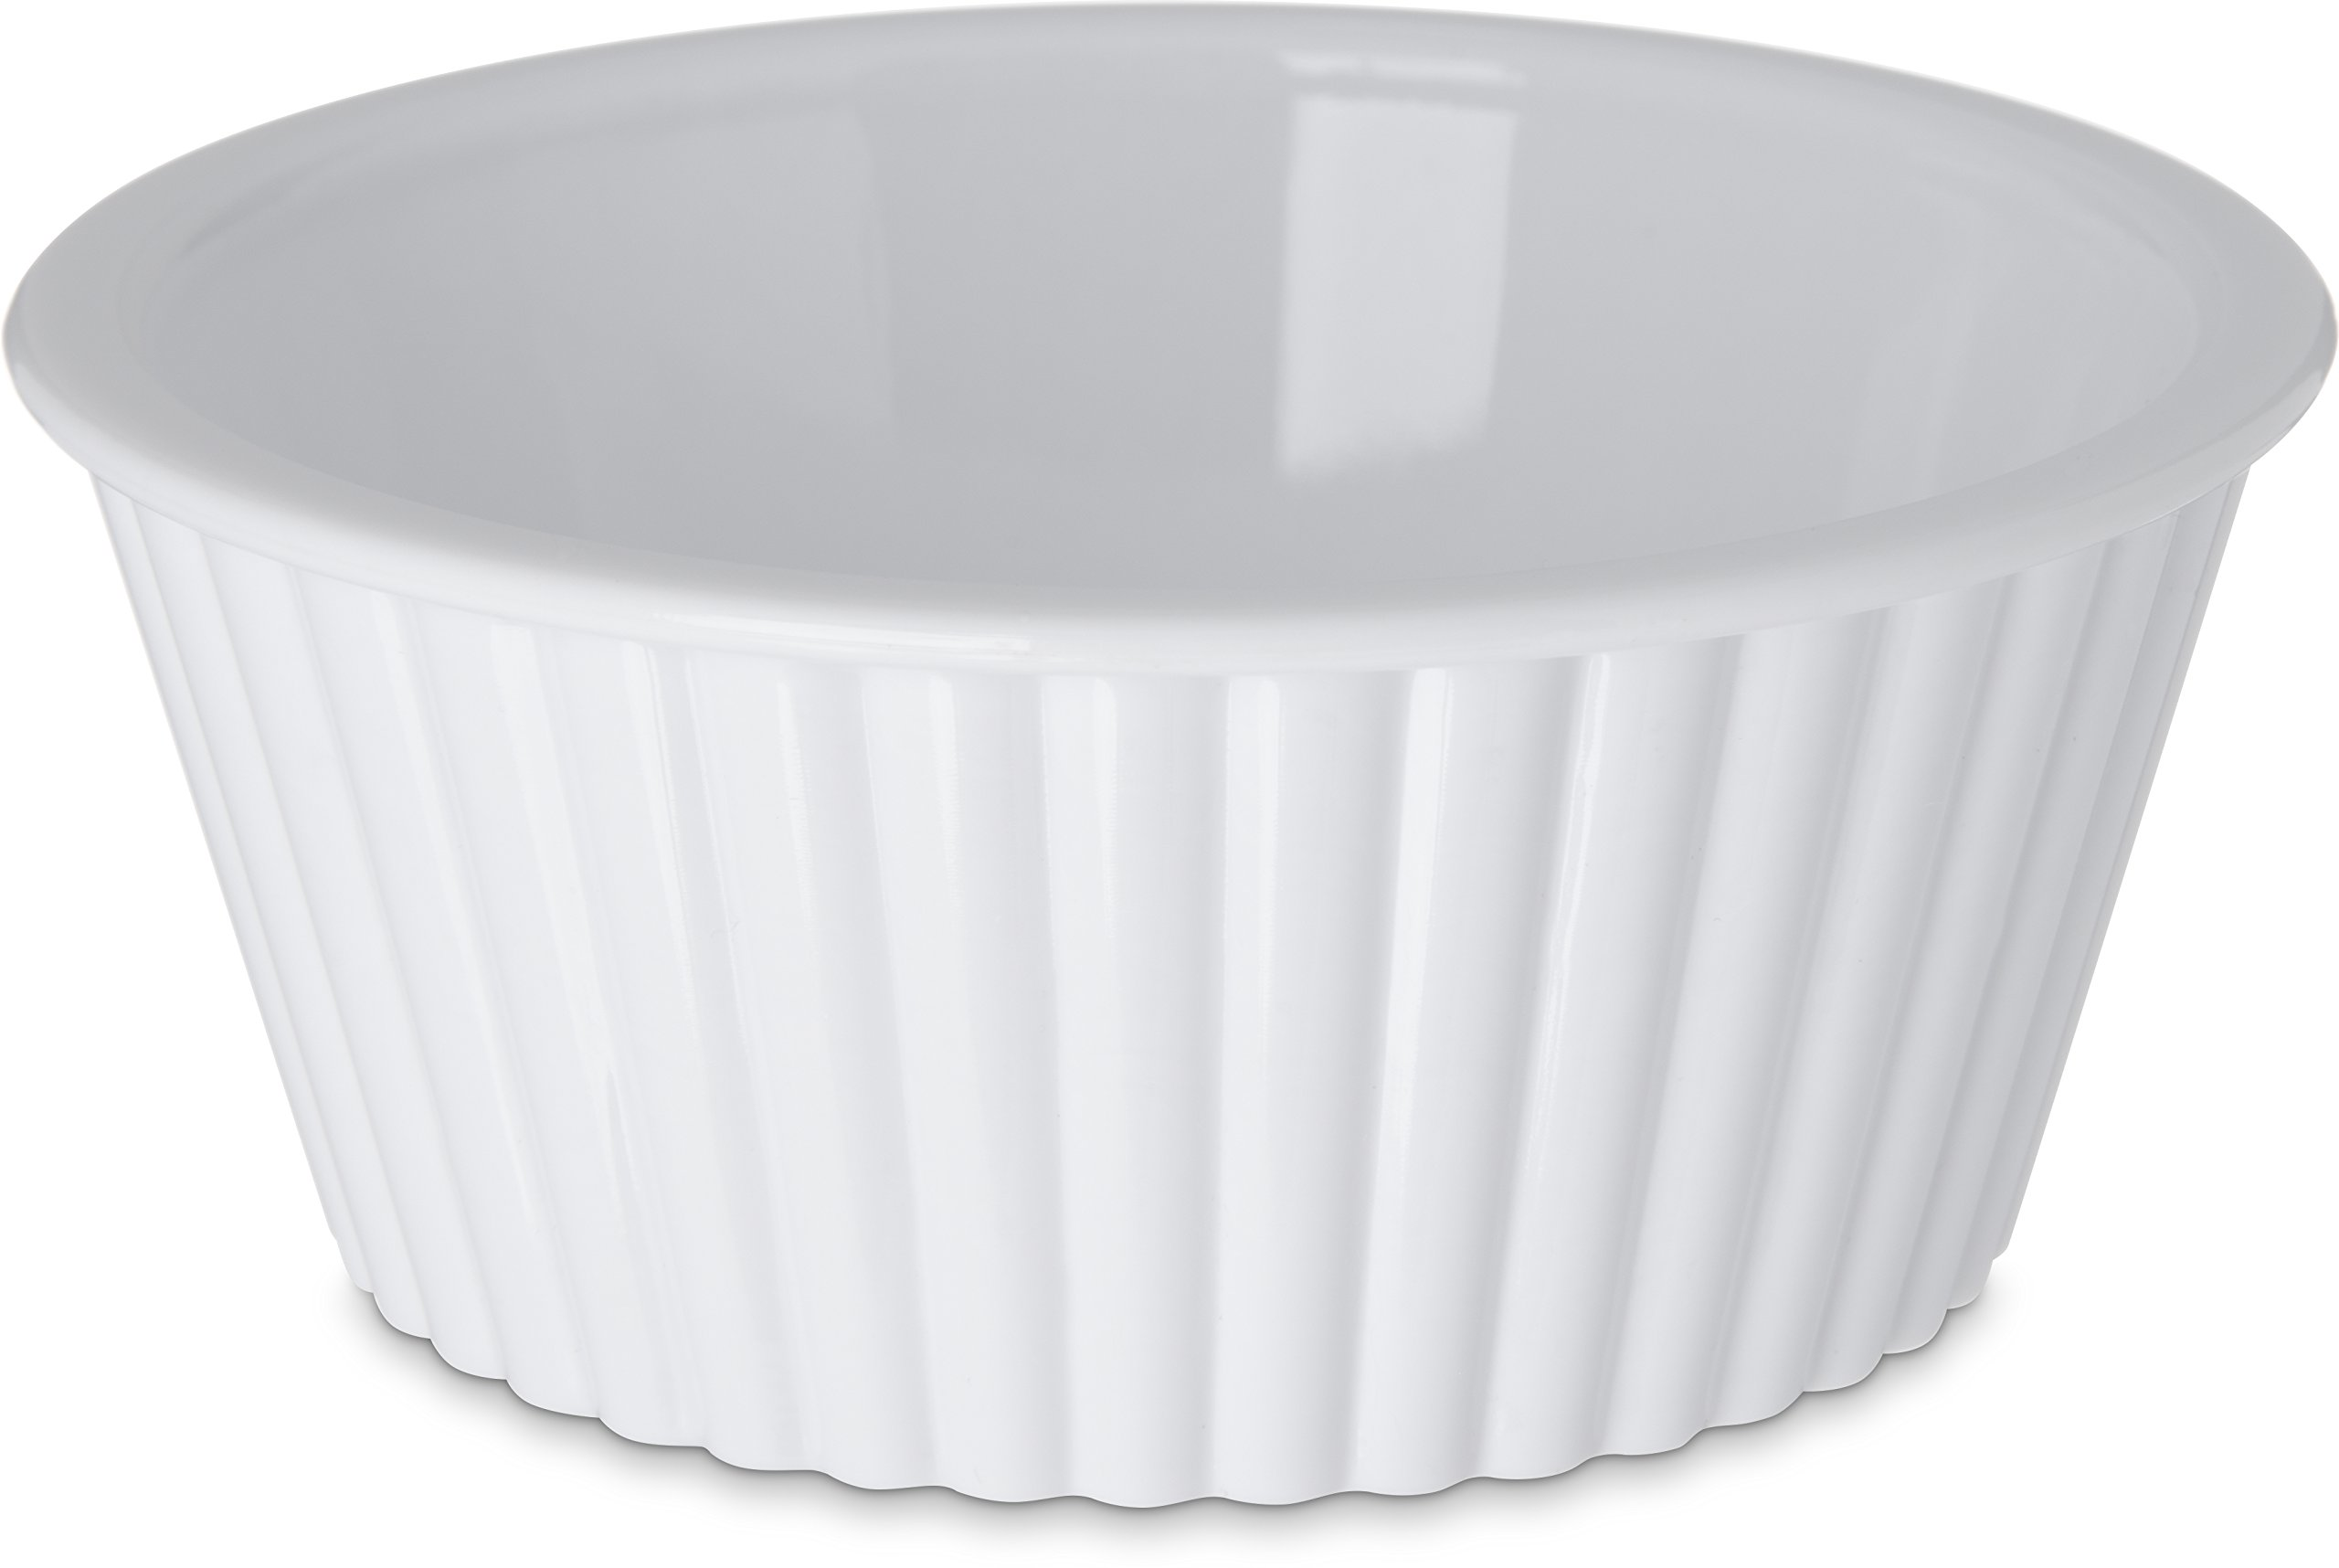 Carlisle 084502 SAN Fluted Ramekin, 4.5-o.z Capacity, 1.50 x 3.50'', White (Case of 48)